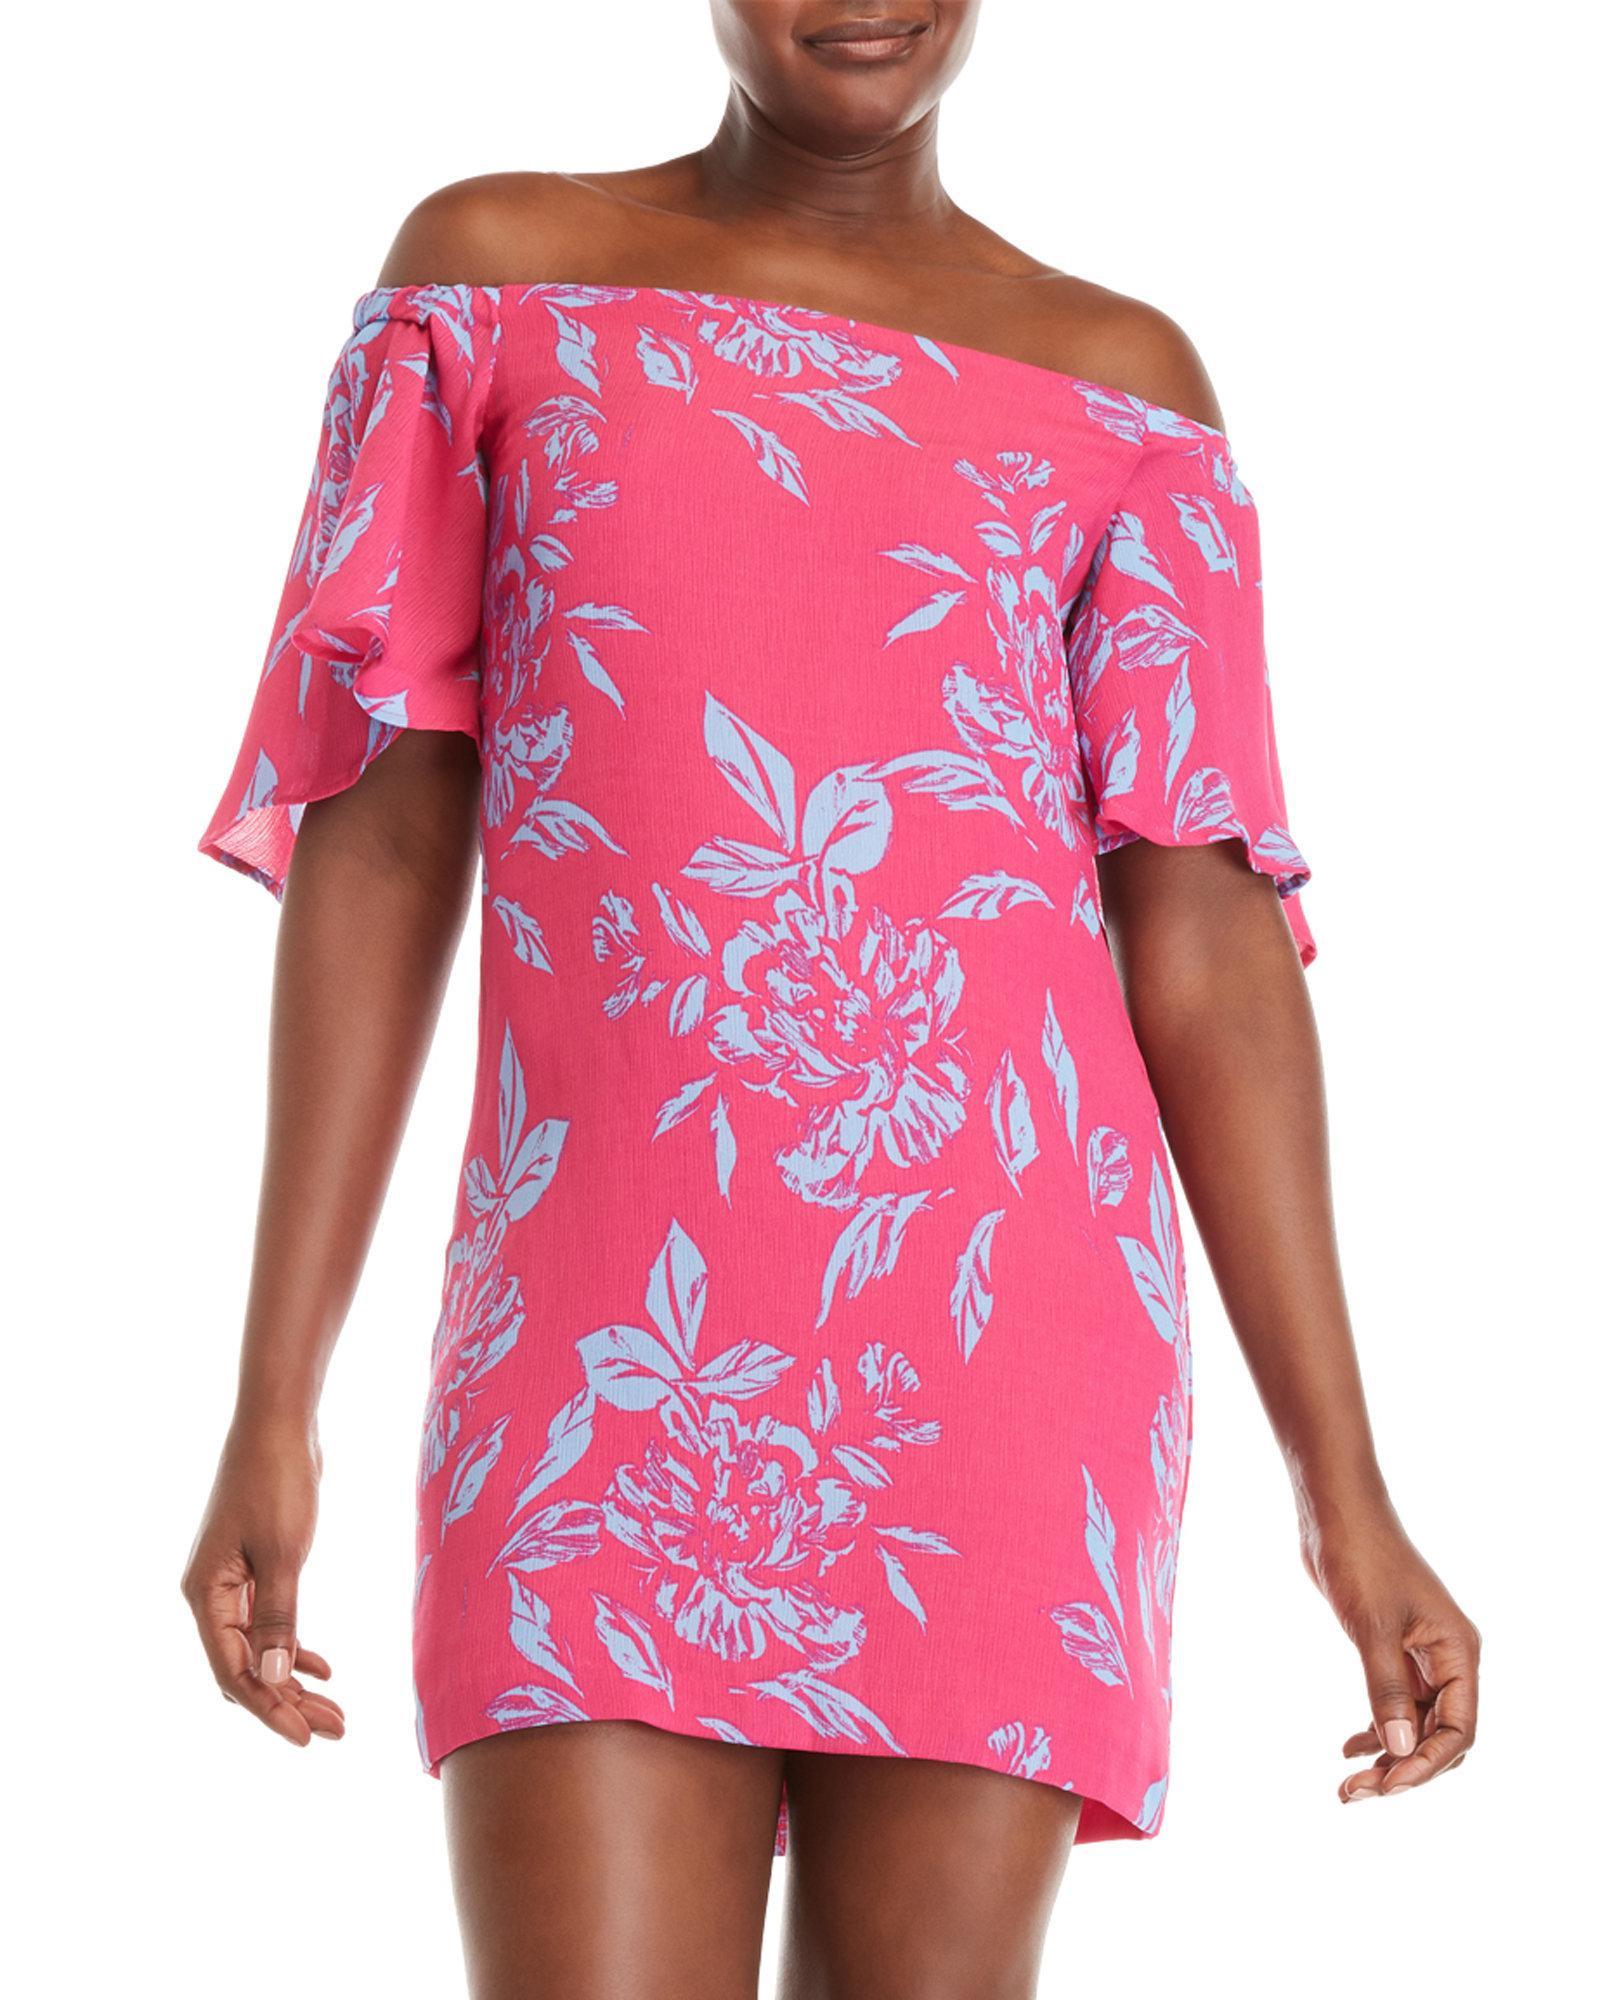 277c90f88d6 Lyst - Charles Henry Floral Off-the-shoulder Dress in Pink